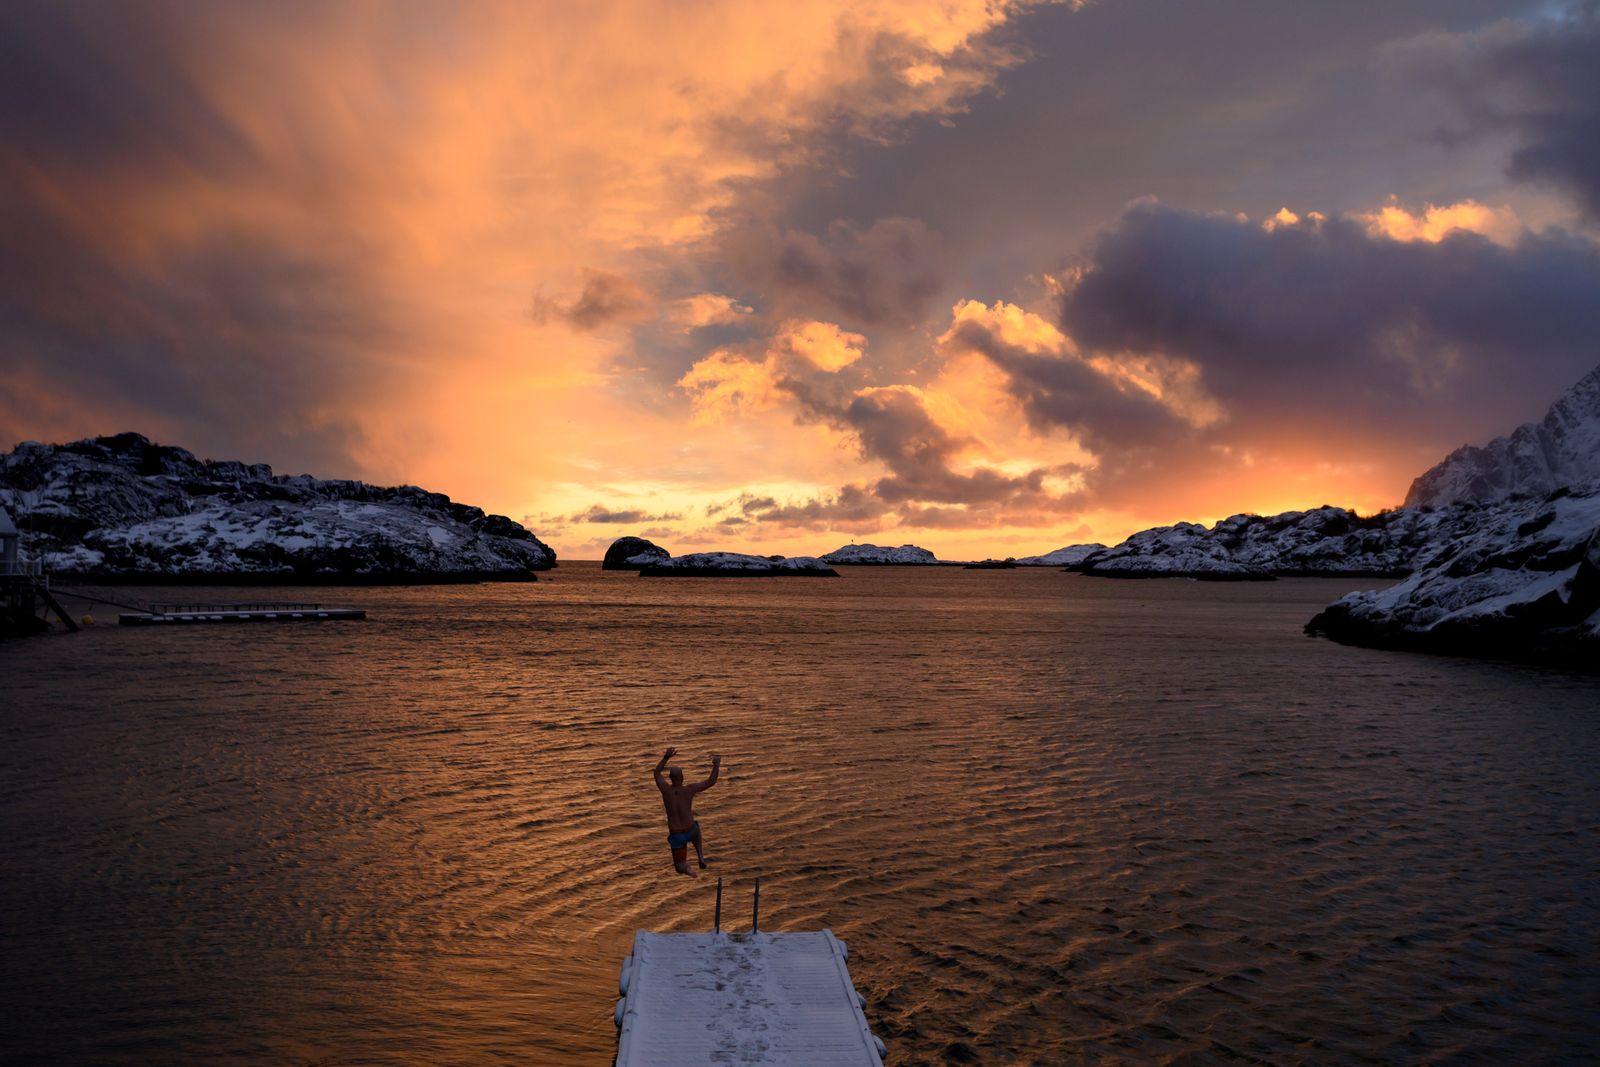 NORWAY-ARCTIC-SUNSET-WINTER